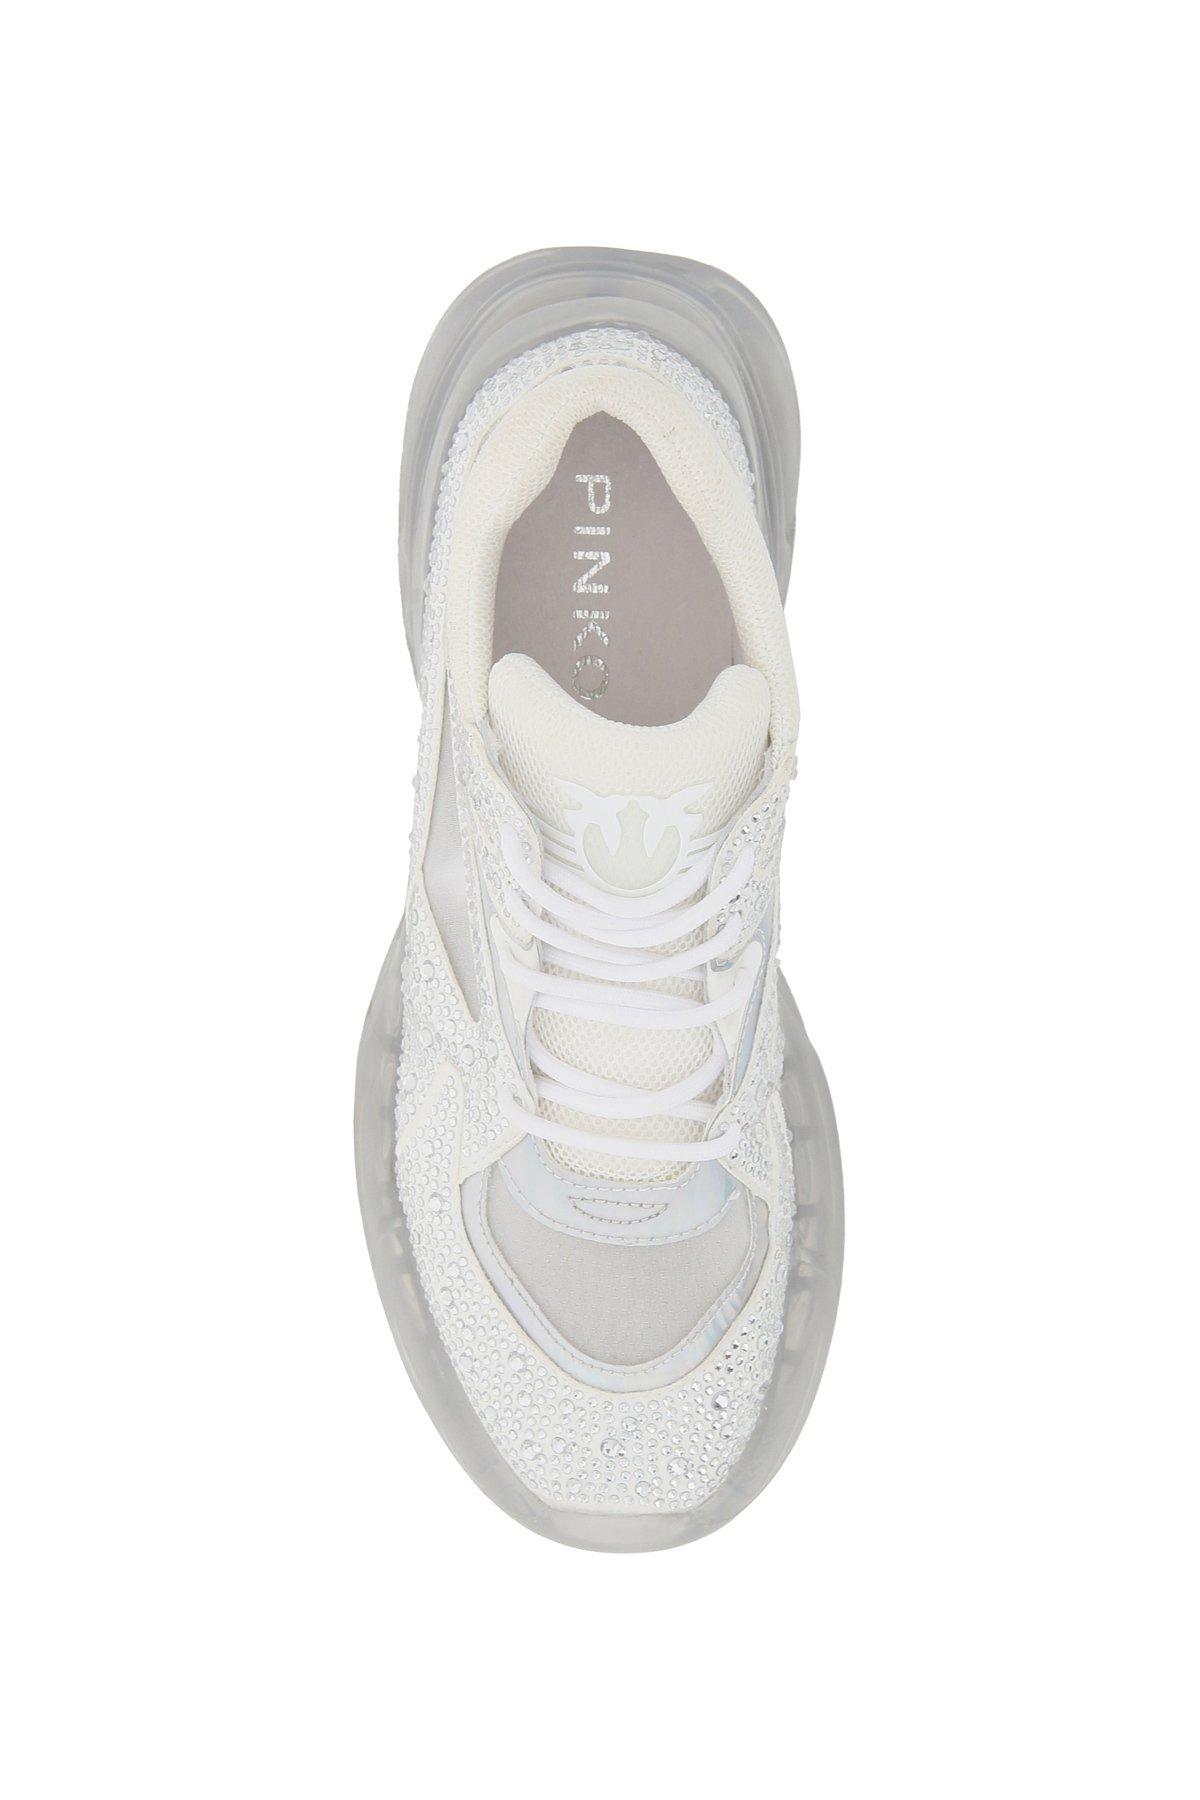 Pinko sneakers rubino diamond 1